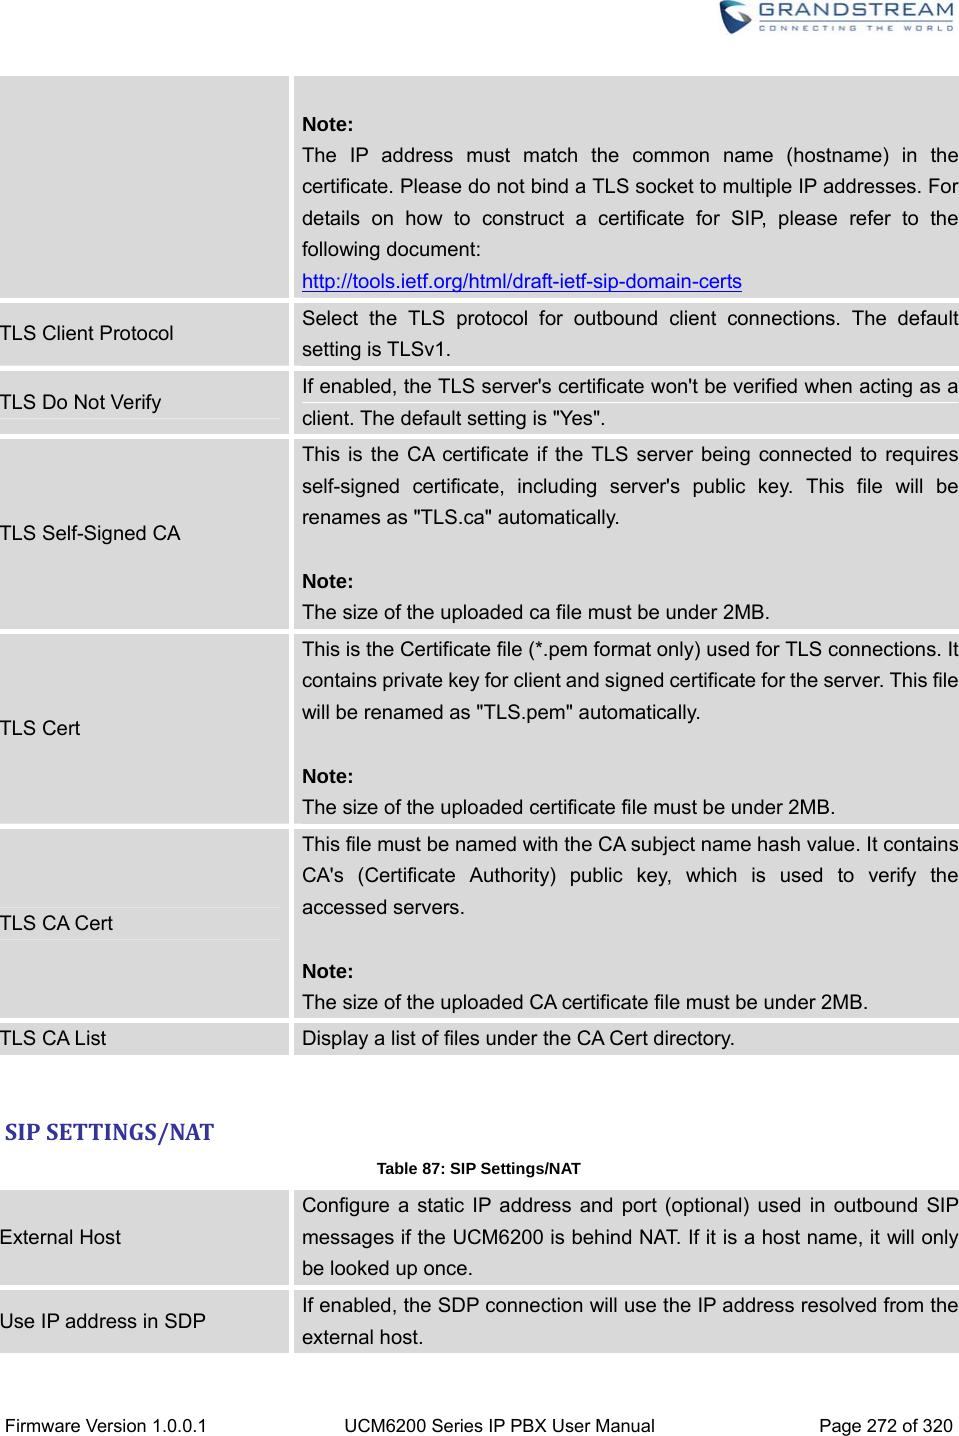 Grandstream Networks UCM6208 IP PBX User Manual 1 UCM62xx